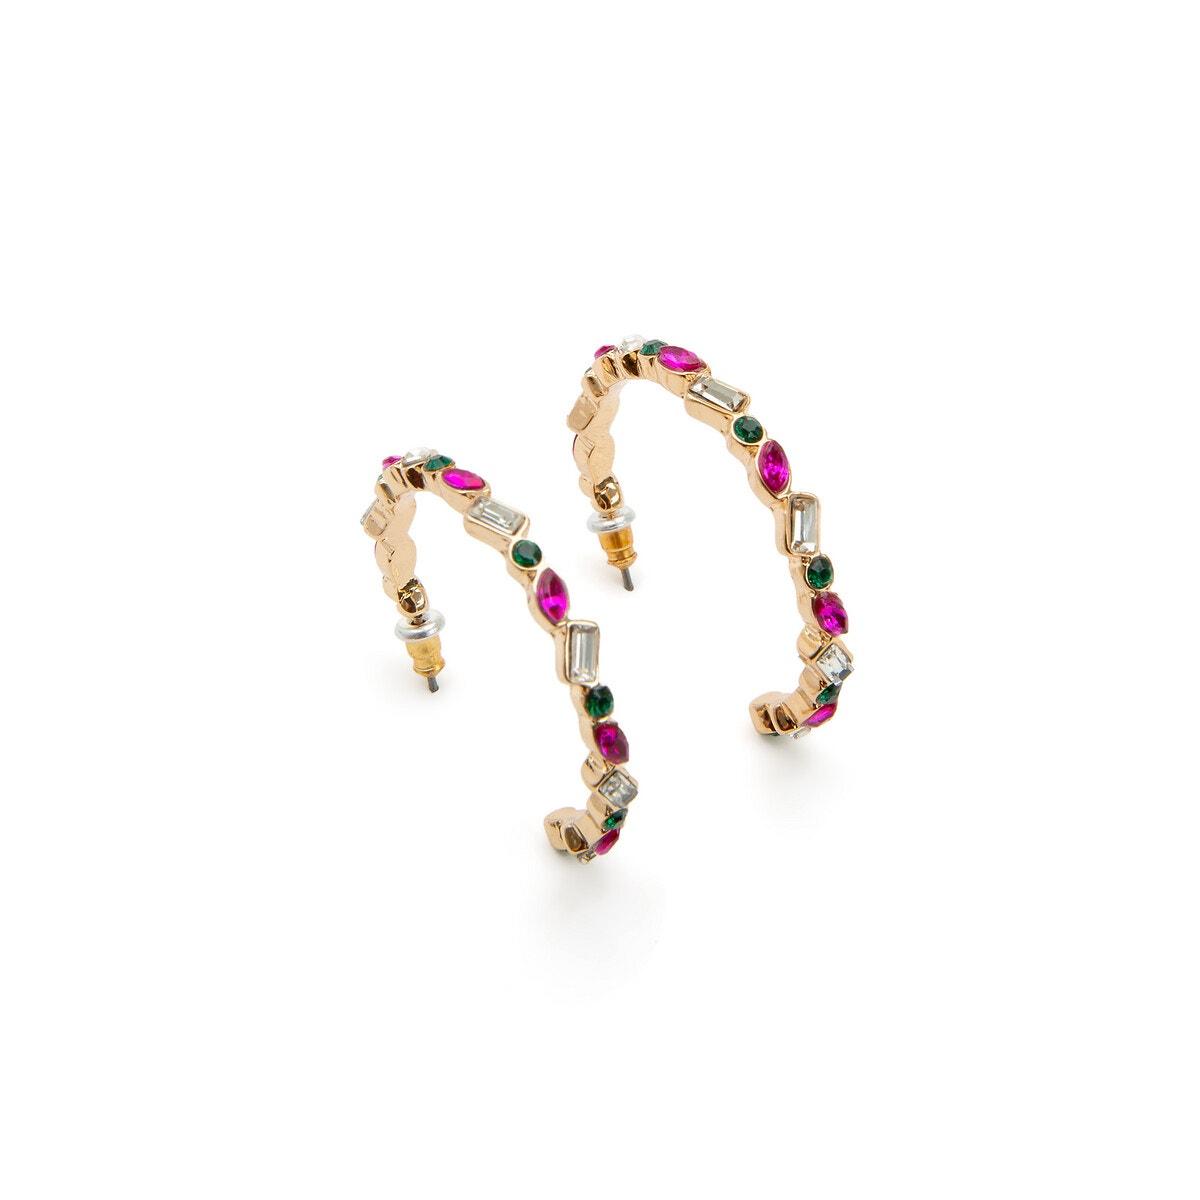 La Redoute Collections - Κρεμαστά σκουλαρίκια με στρας - 6421